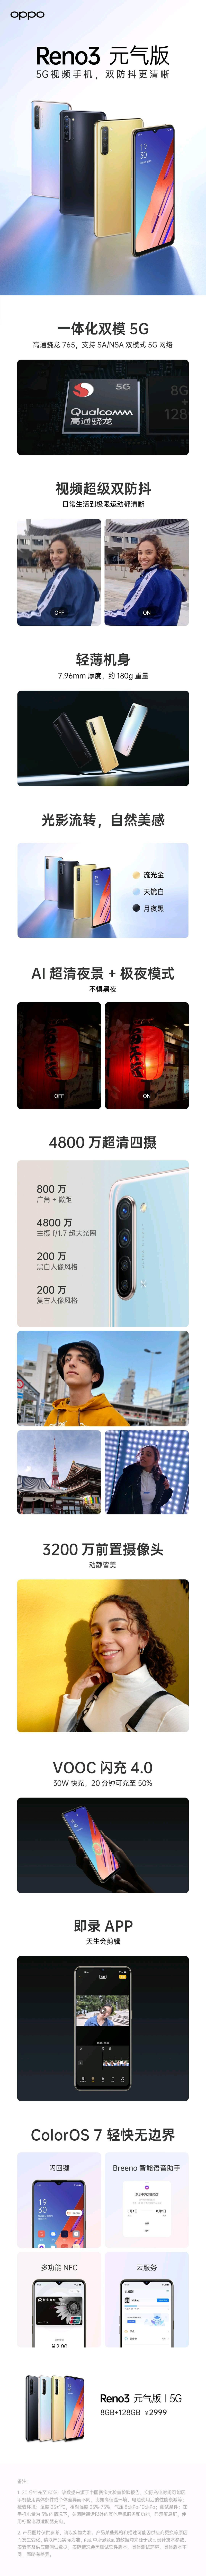 OPPO Reno3 元气版2999元预售 开启活力5G视频生活